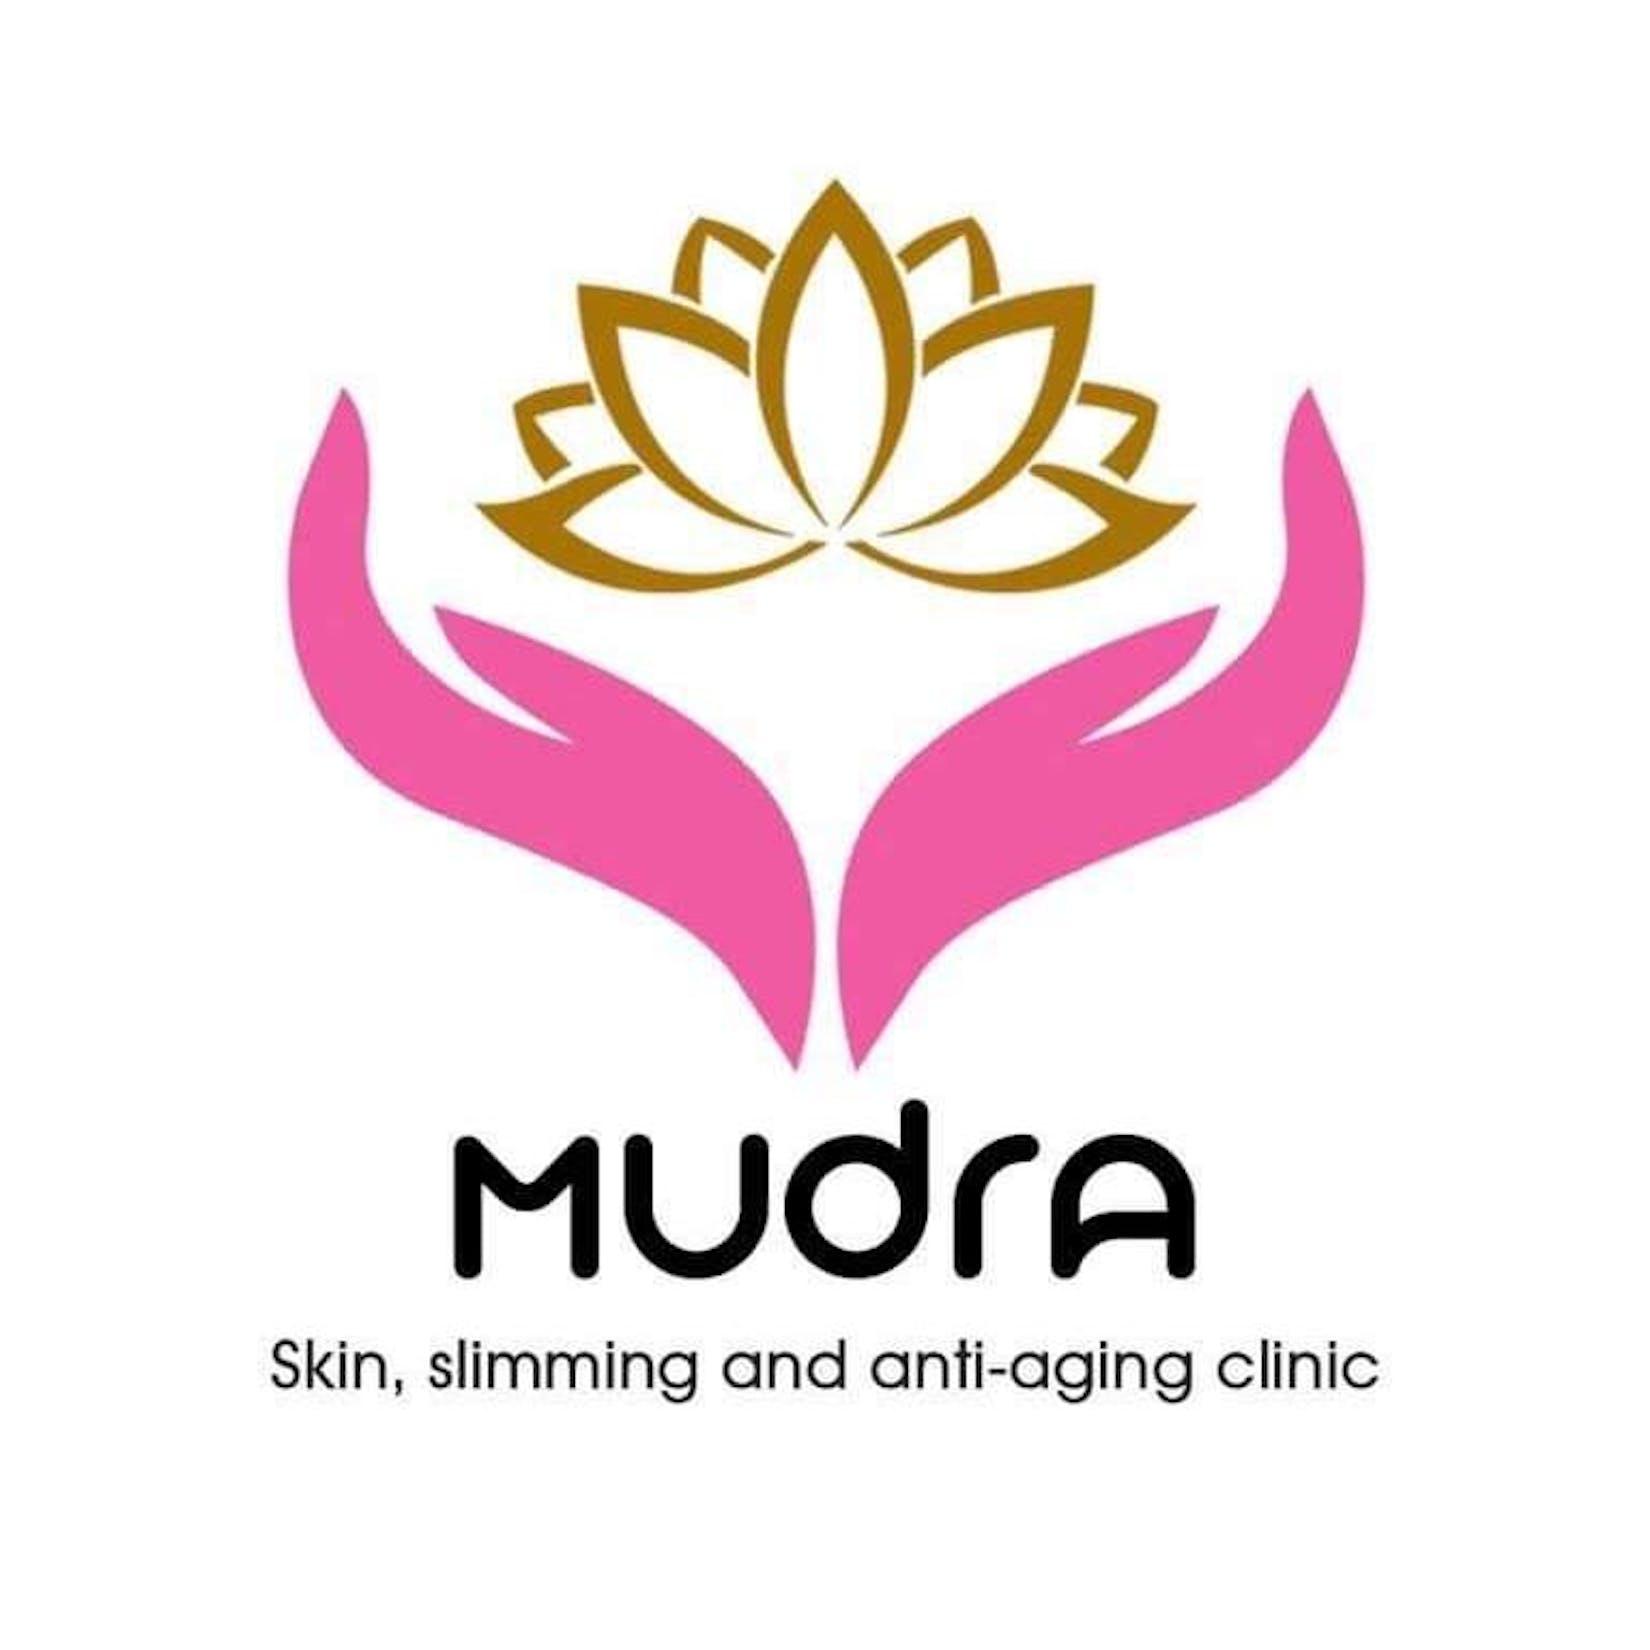 MUDRA Skin, Slimming & Anti-aging Clinic | Beauty